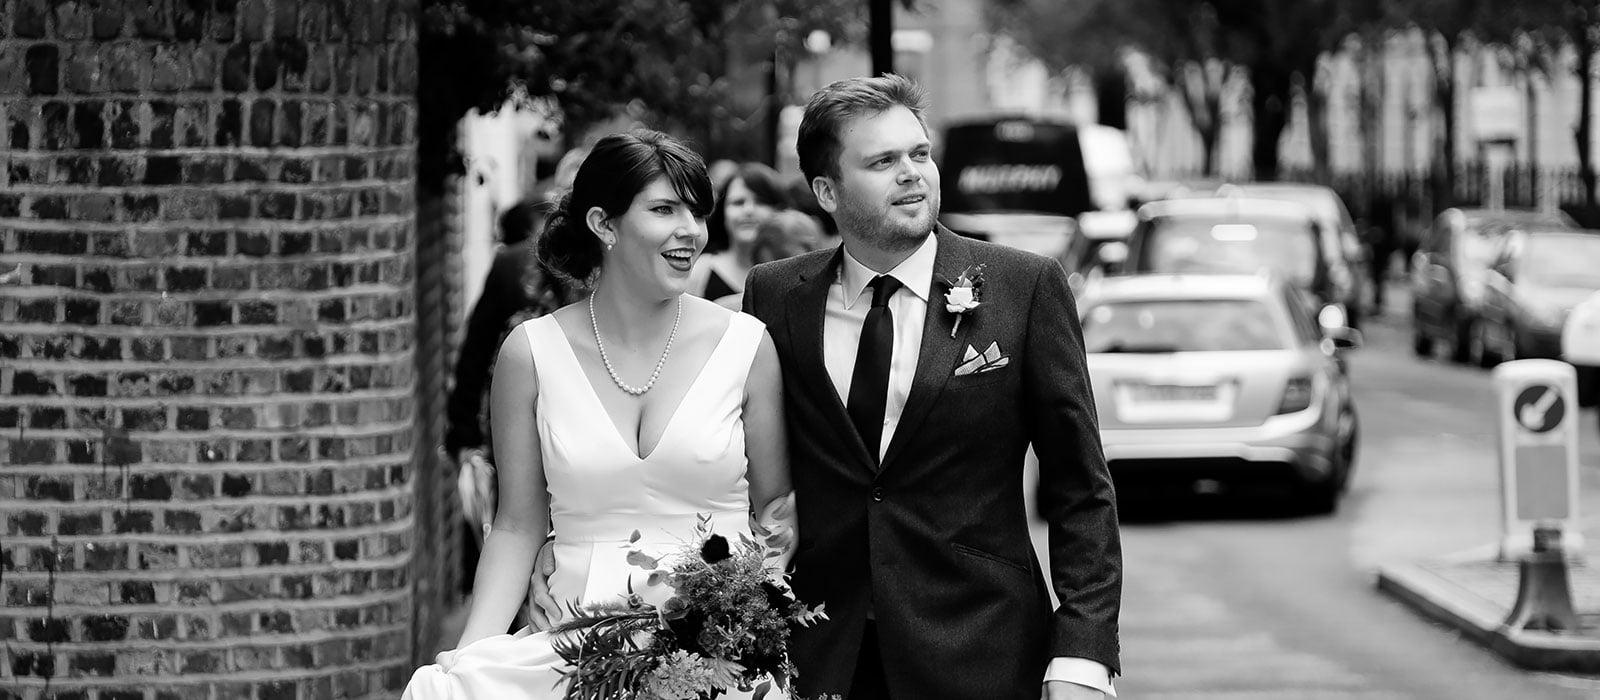 Islington Town Hall Wedding | Julie and Tom